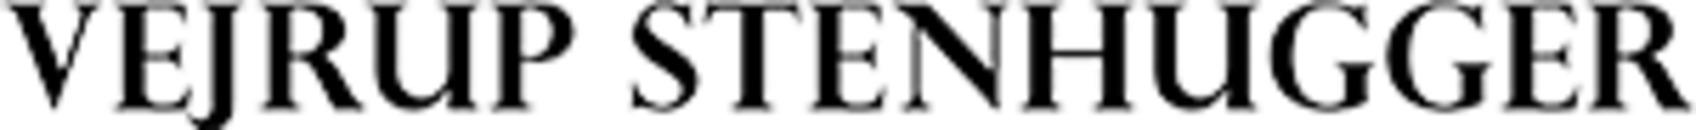 Jørgen Martin Pedersen Stenhugger logo